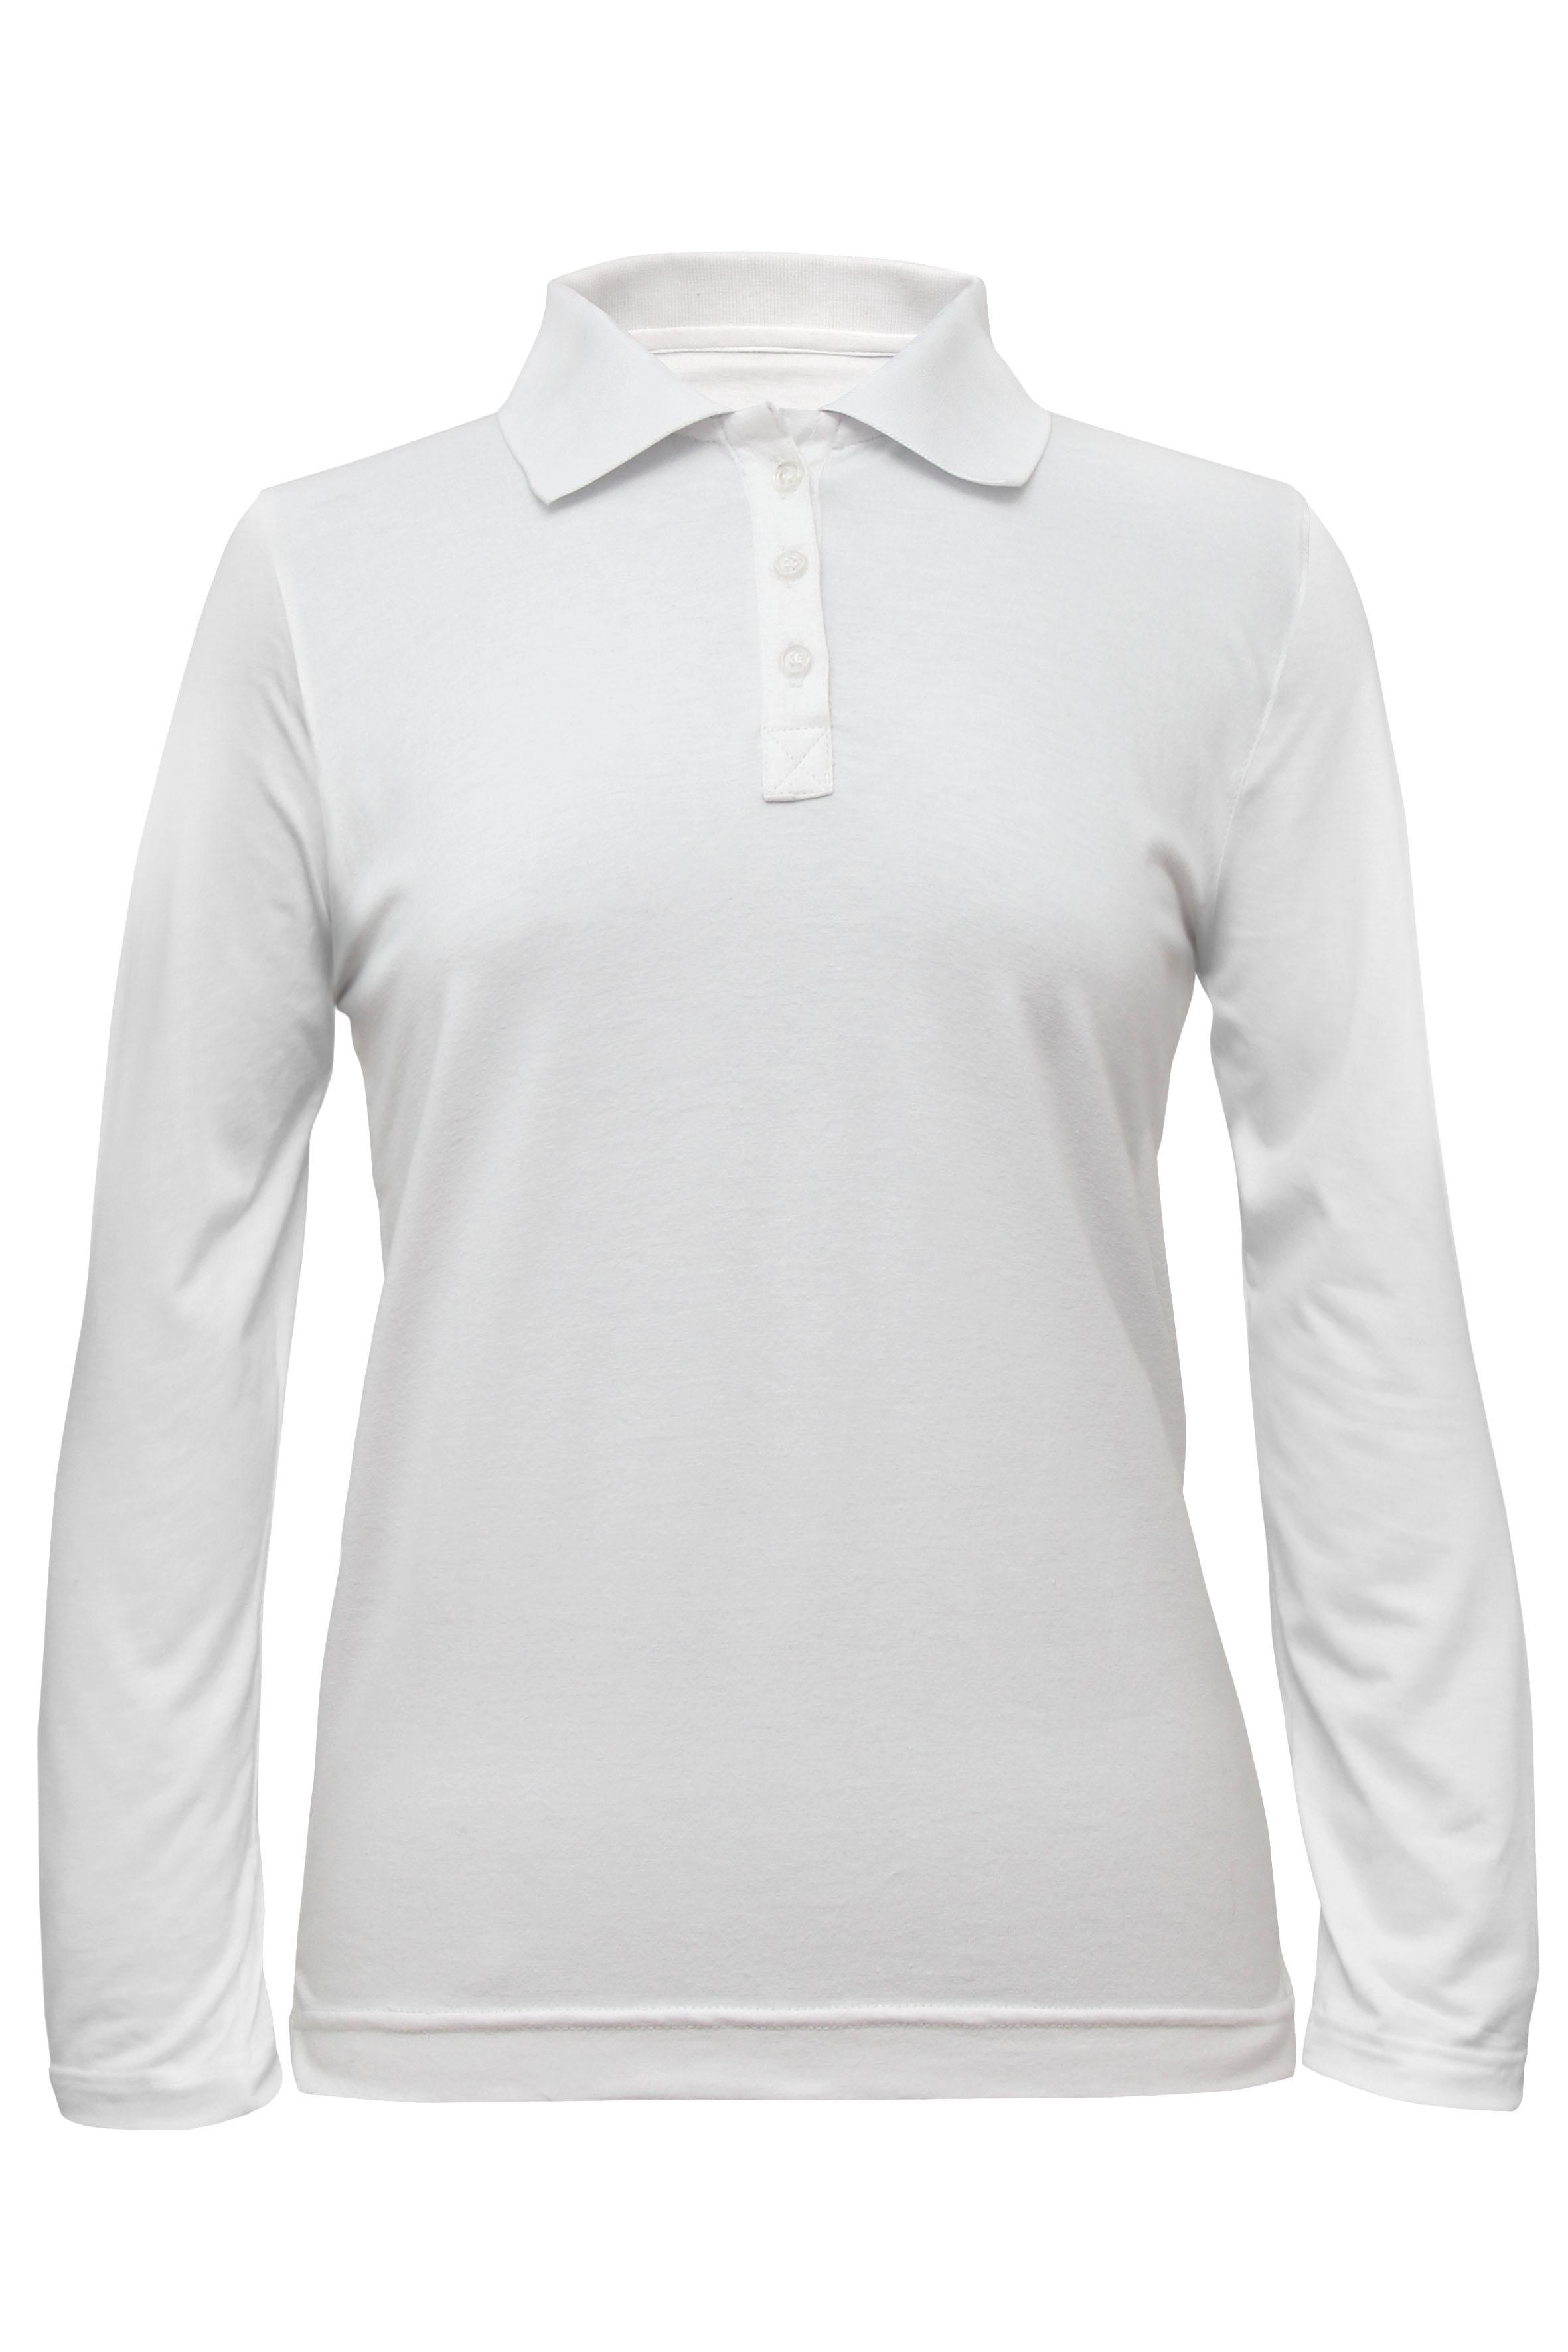 Polo bijela UV majica ženska d.r.